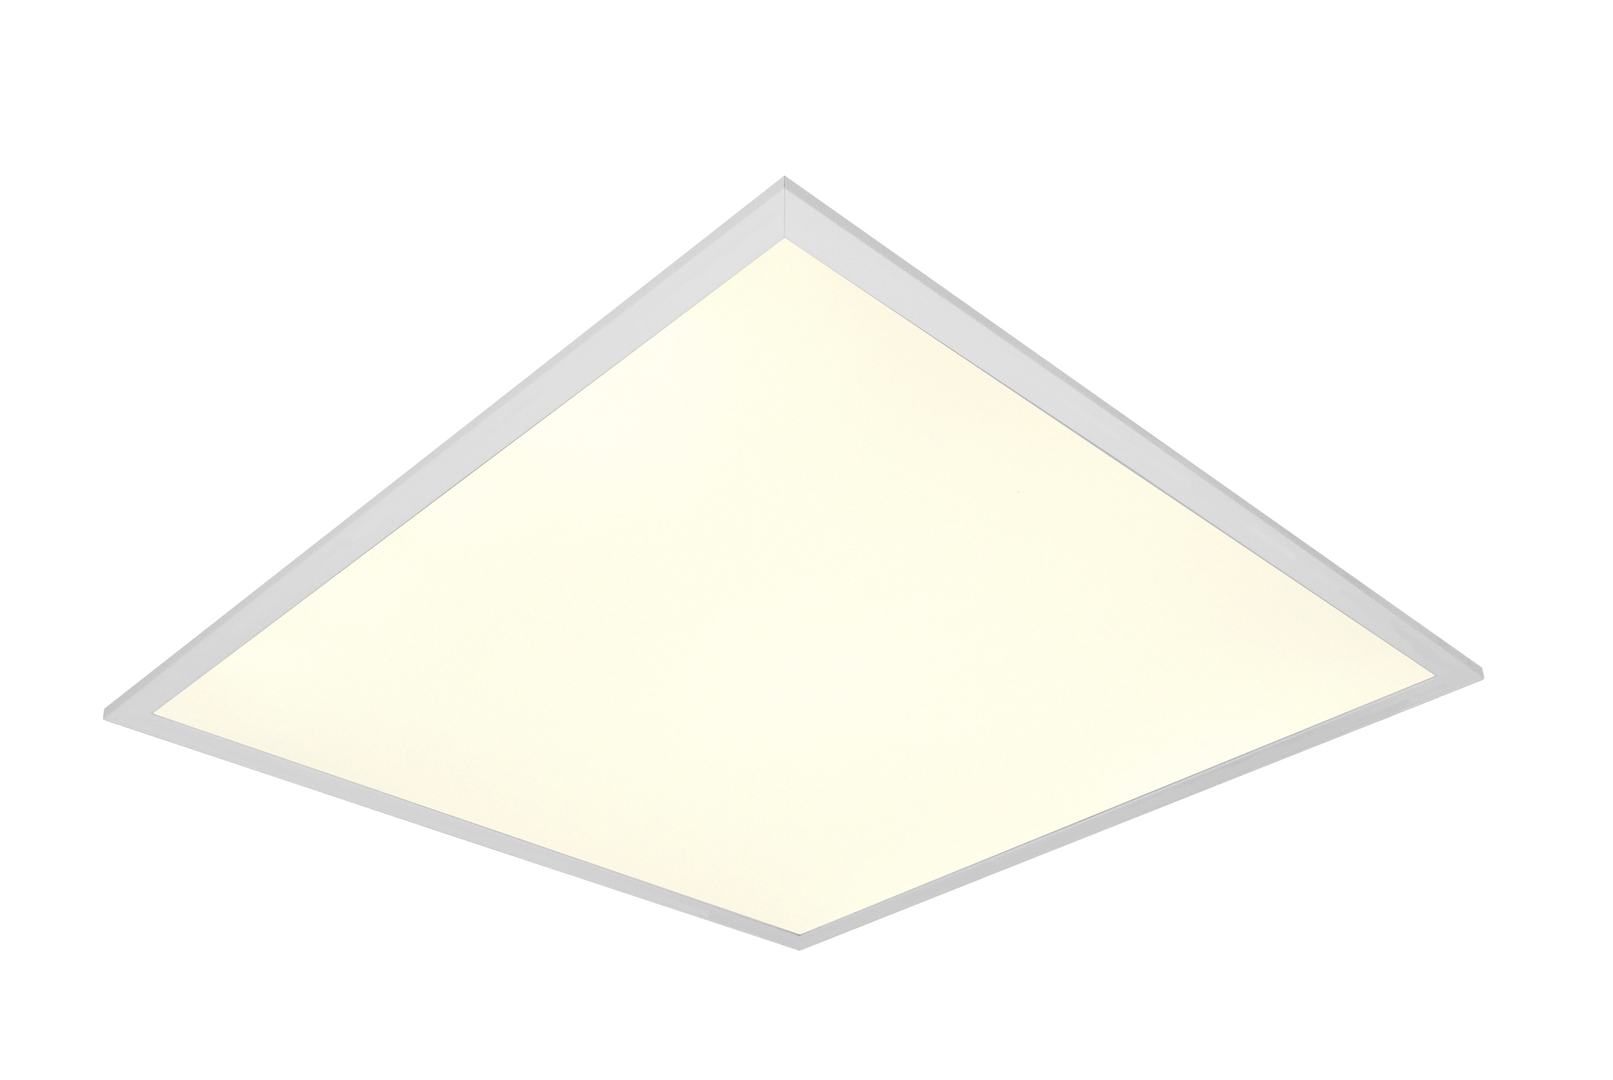 Panou LED pătrat alb 80W 230V IP20 4000K